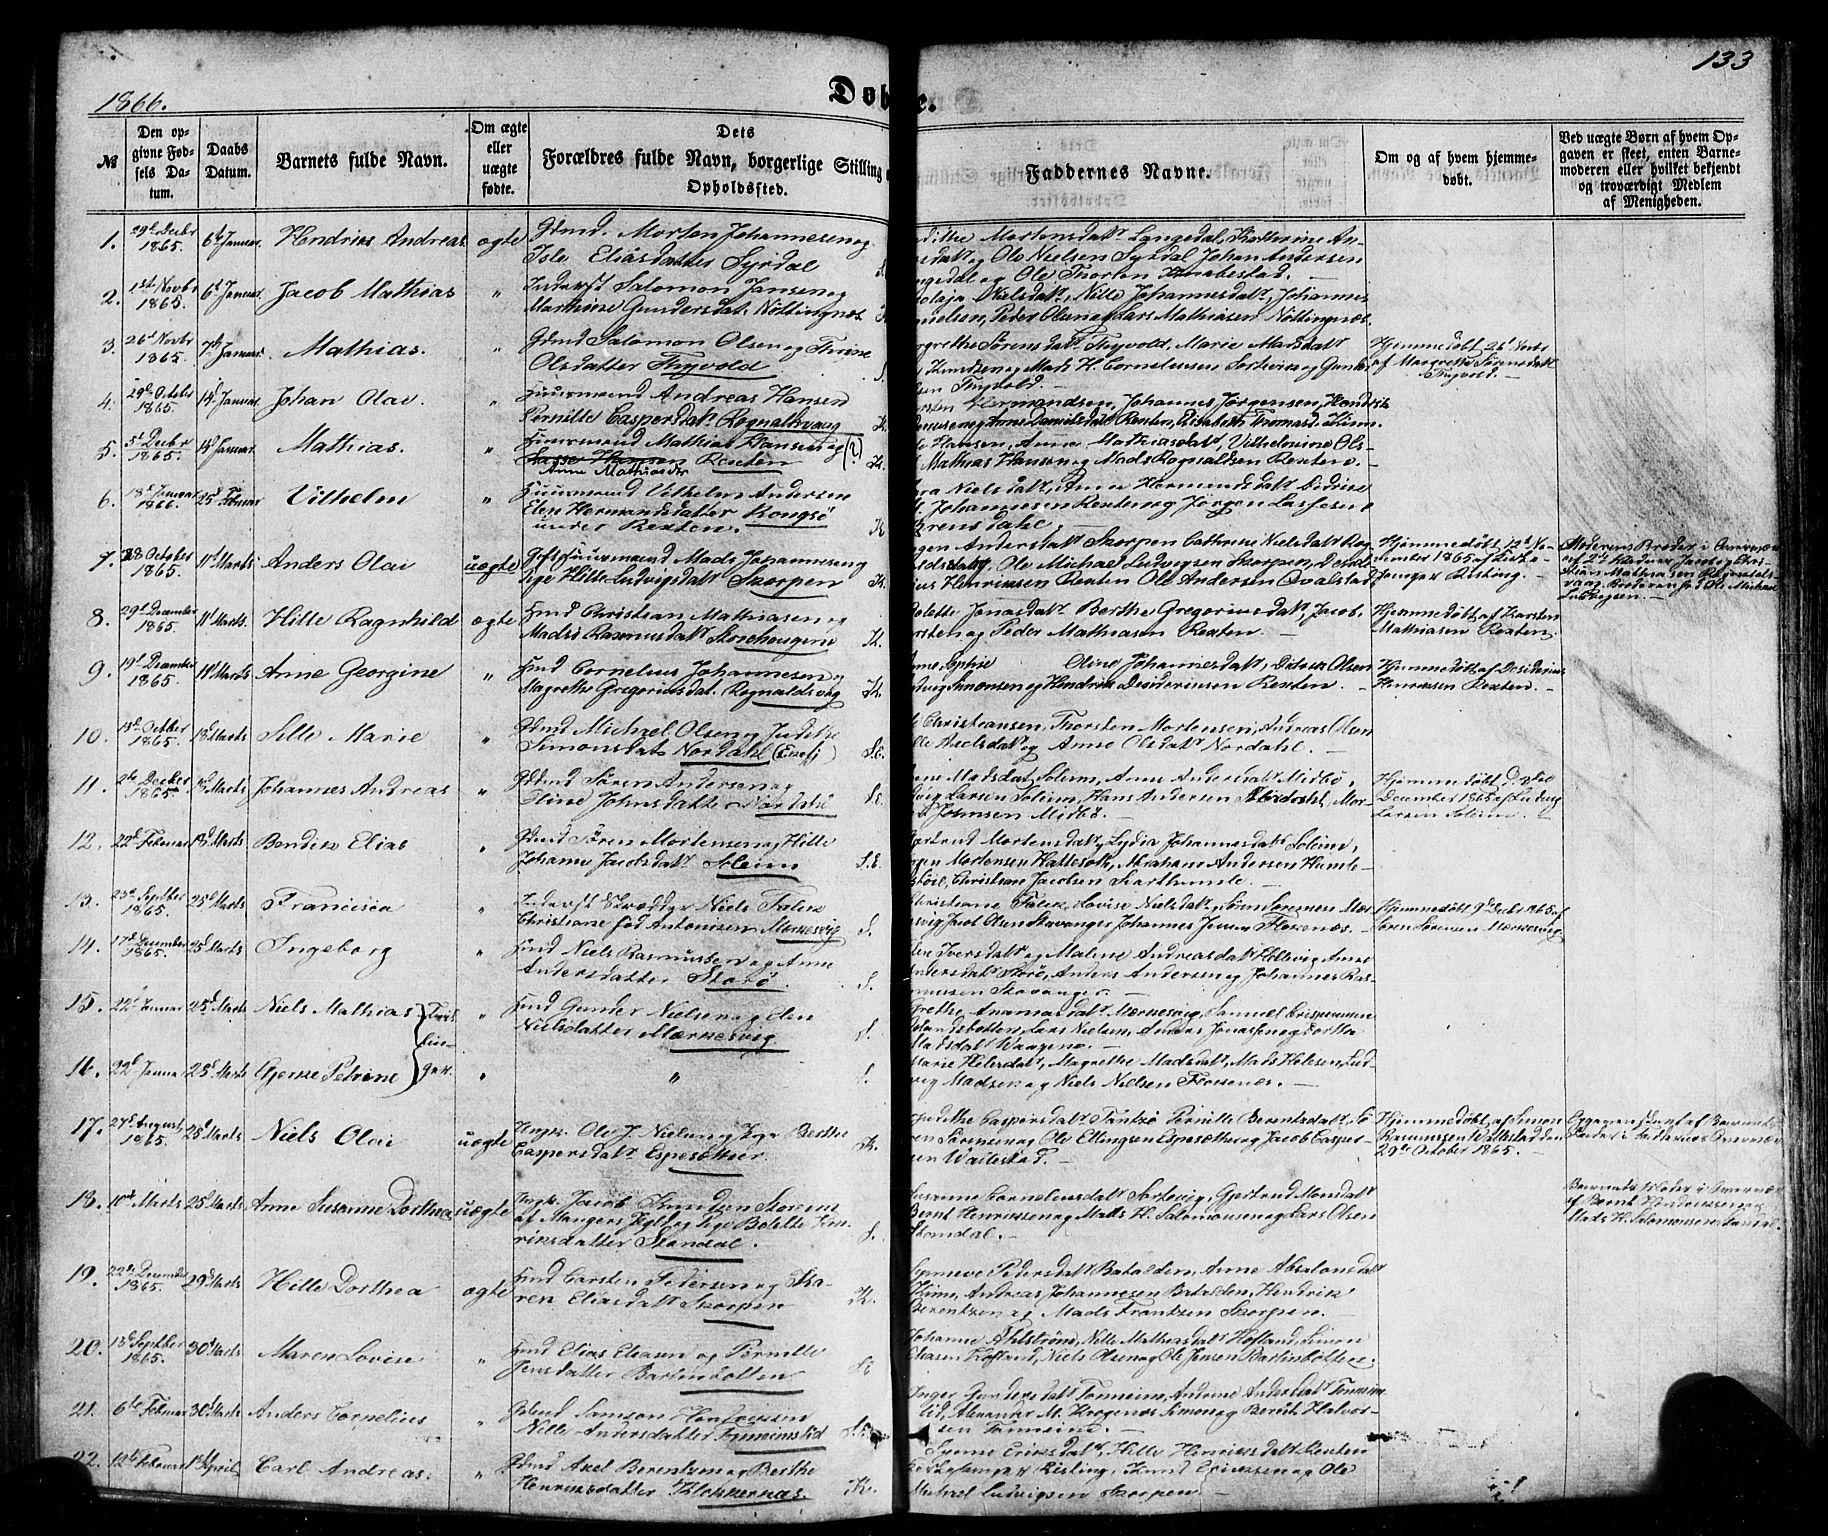 SAB, Kinn sokneprestembete, H/Haa/Haaa/L0006: Ministerialbok nr. A 6, 1857-1885, s. 133